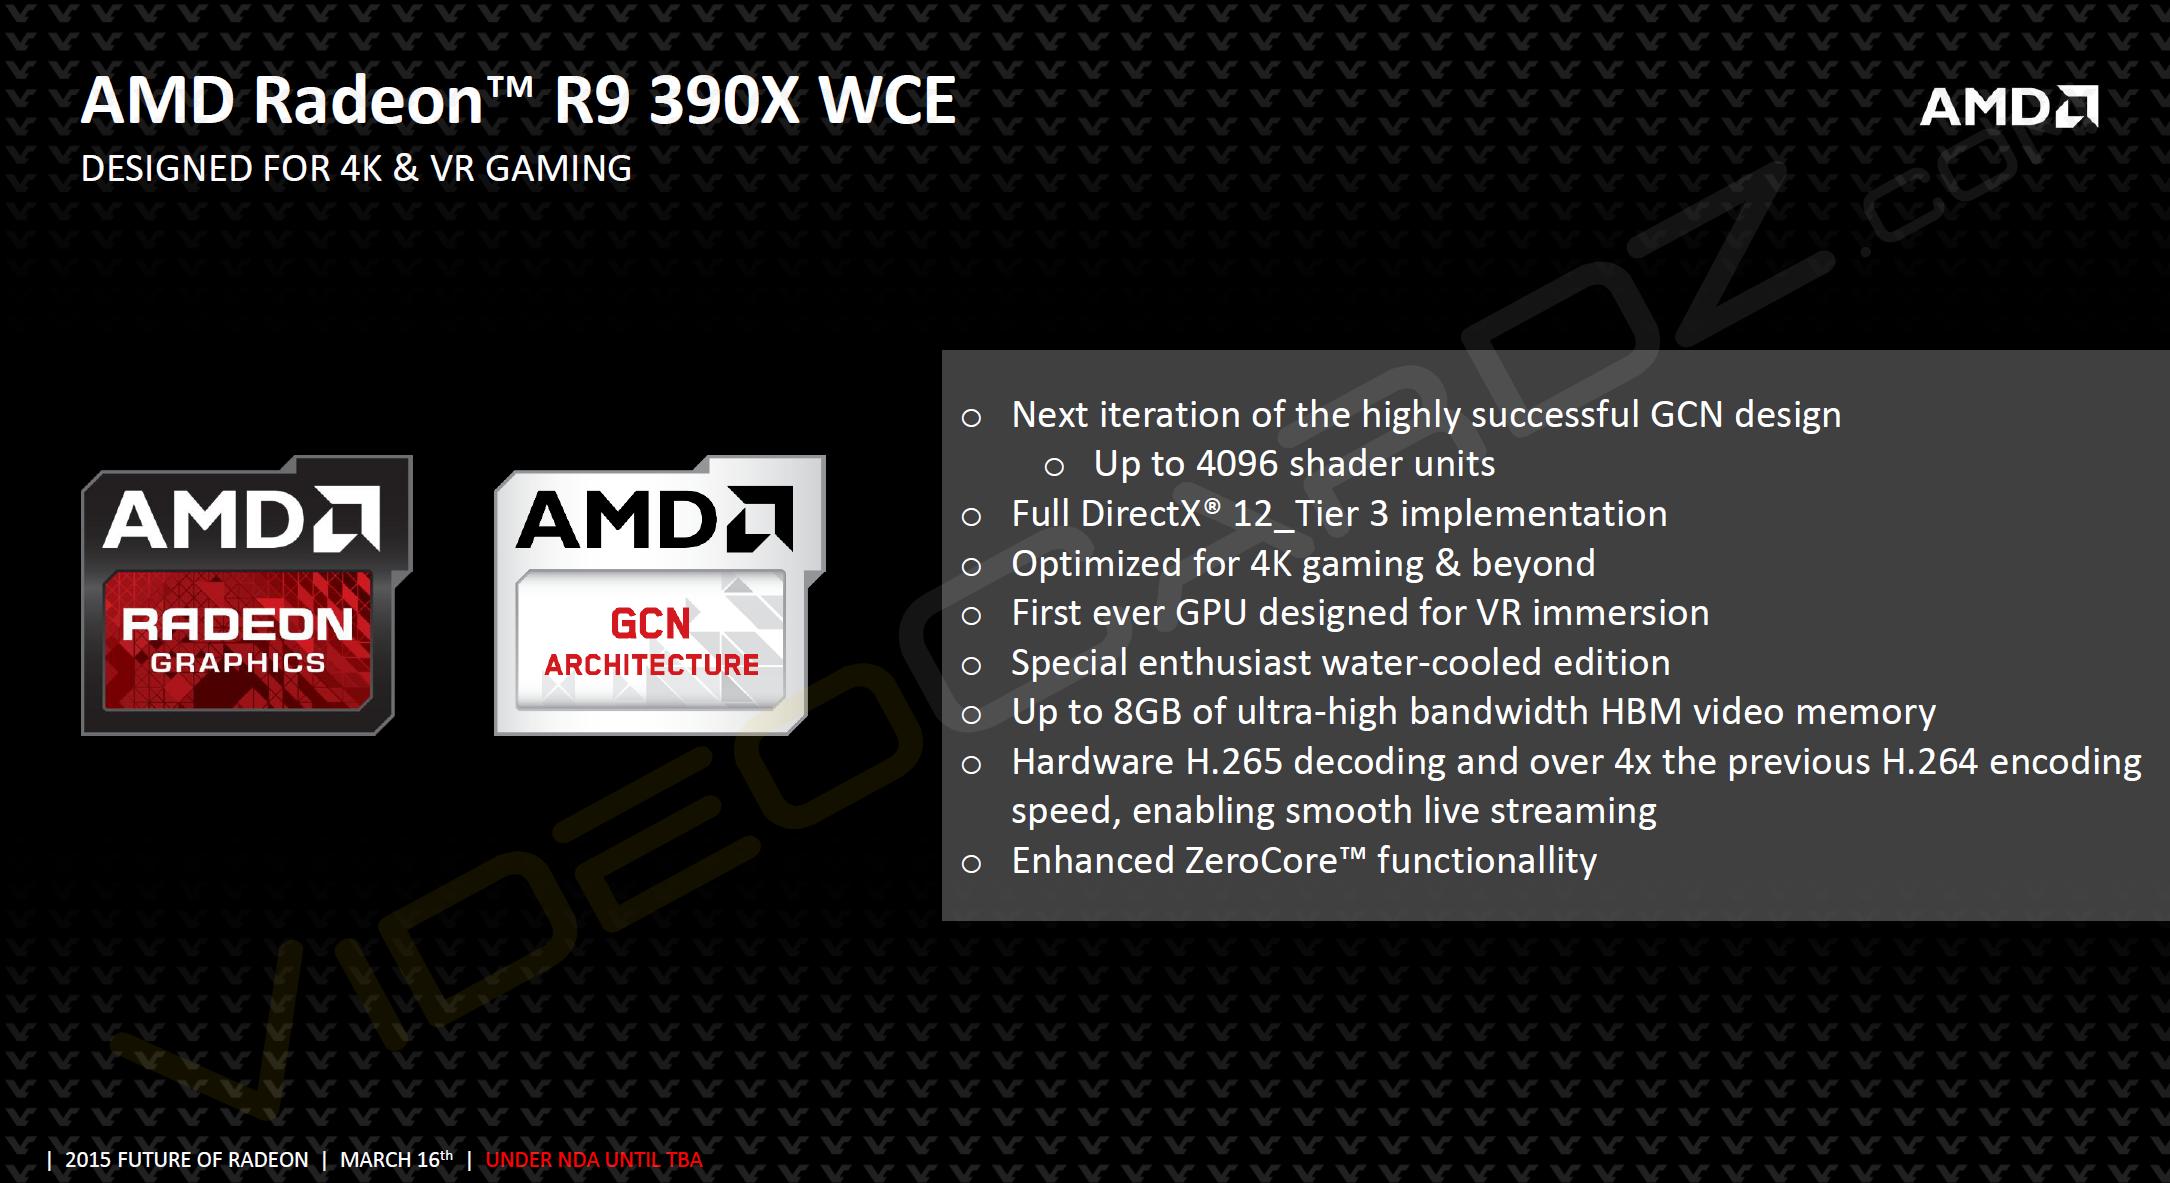 http://cdn.videocardz.com/1/2015/03/AMD-Radeon-R9-390X-WCE.png